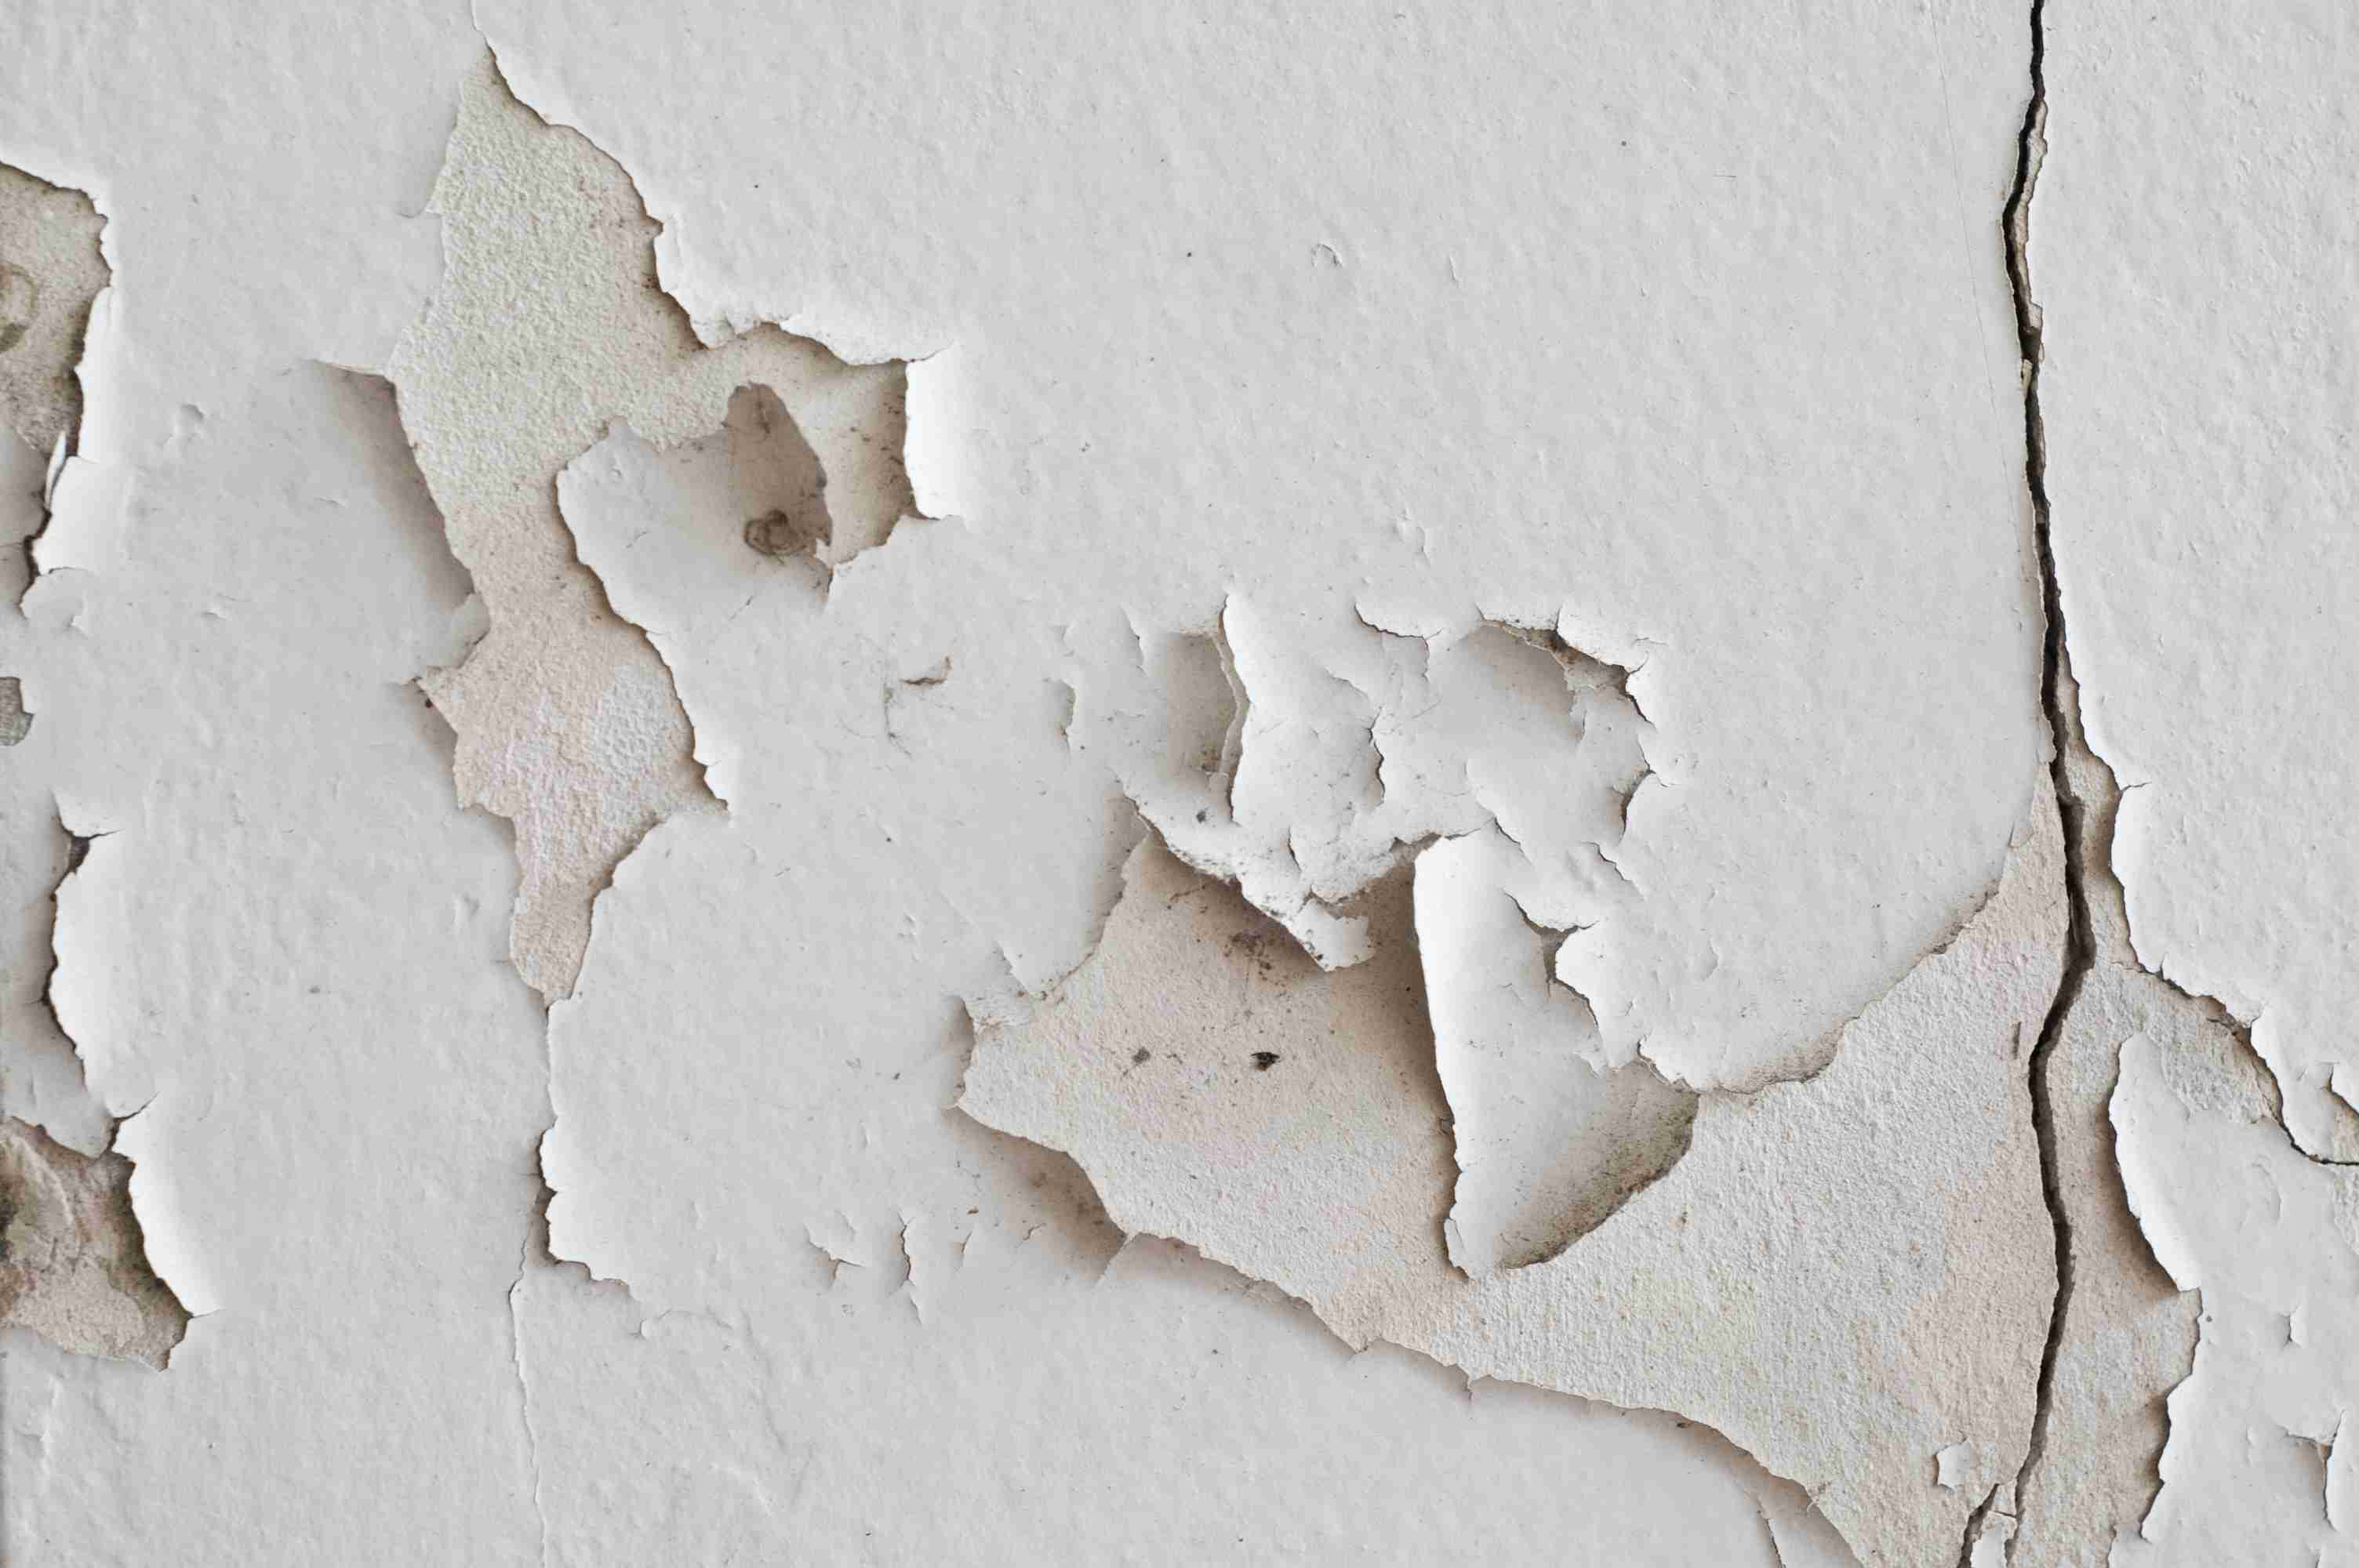 Paint peeling off wall